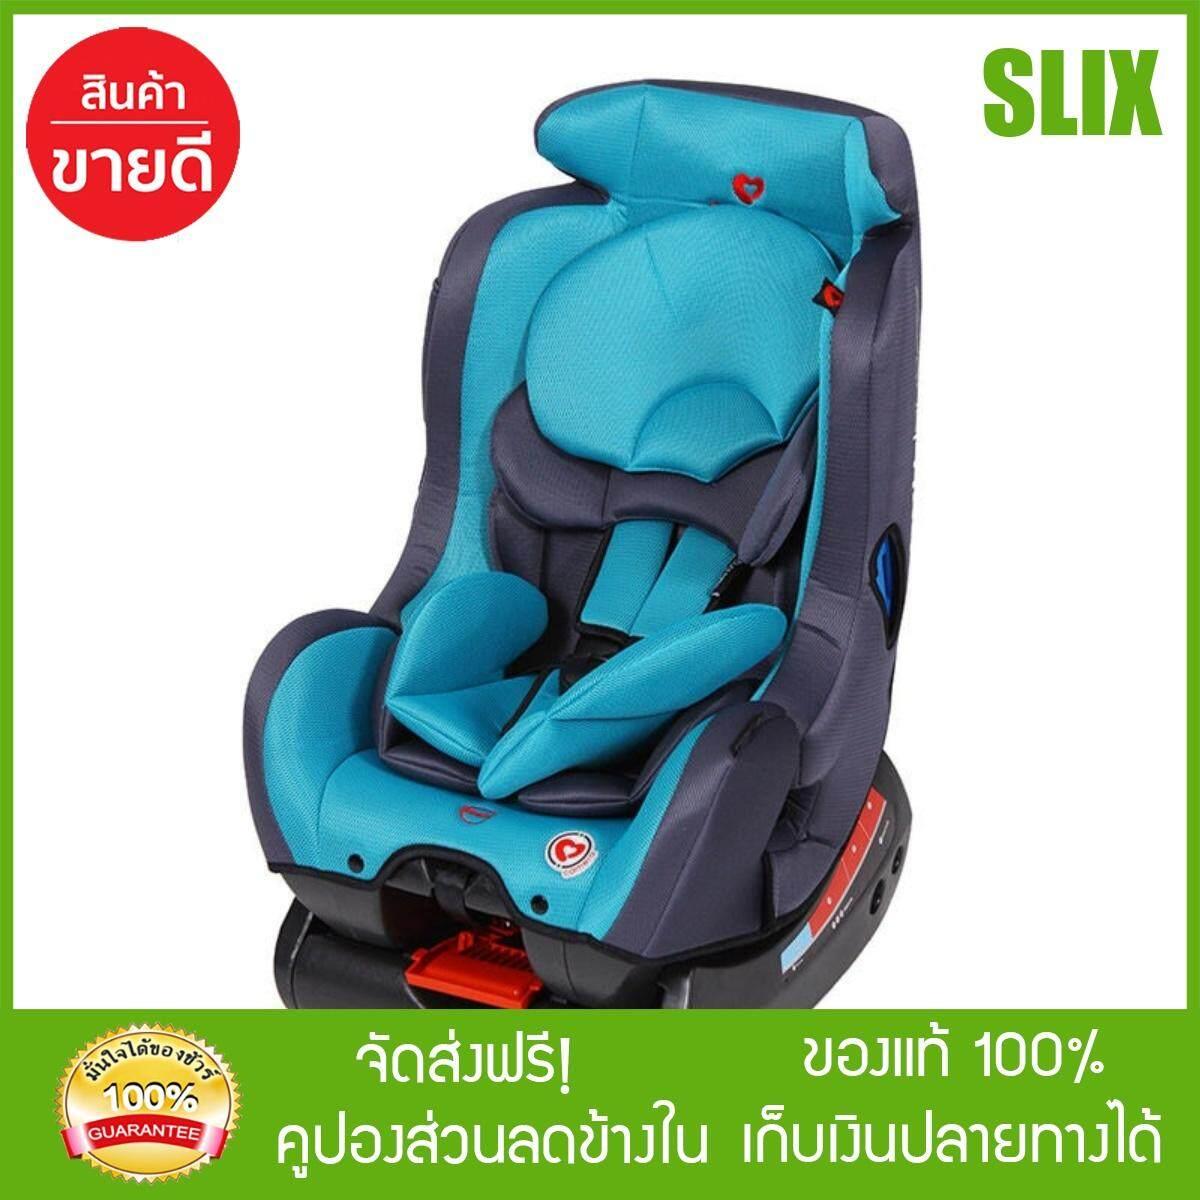 [Slix]- CAMERA เบาะติดรถยนต์ 0-7ขวบ backlong 2 หน้าเข้า-ออกได้ ฟ้า คาร์ซีท คาร์ซีทเด็ก คาร์ซีท camera car seat ส่ง Kerry เก็บปลายทางได้